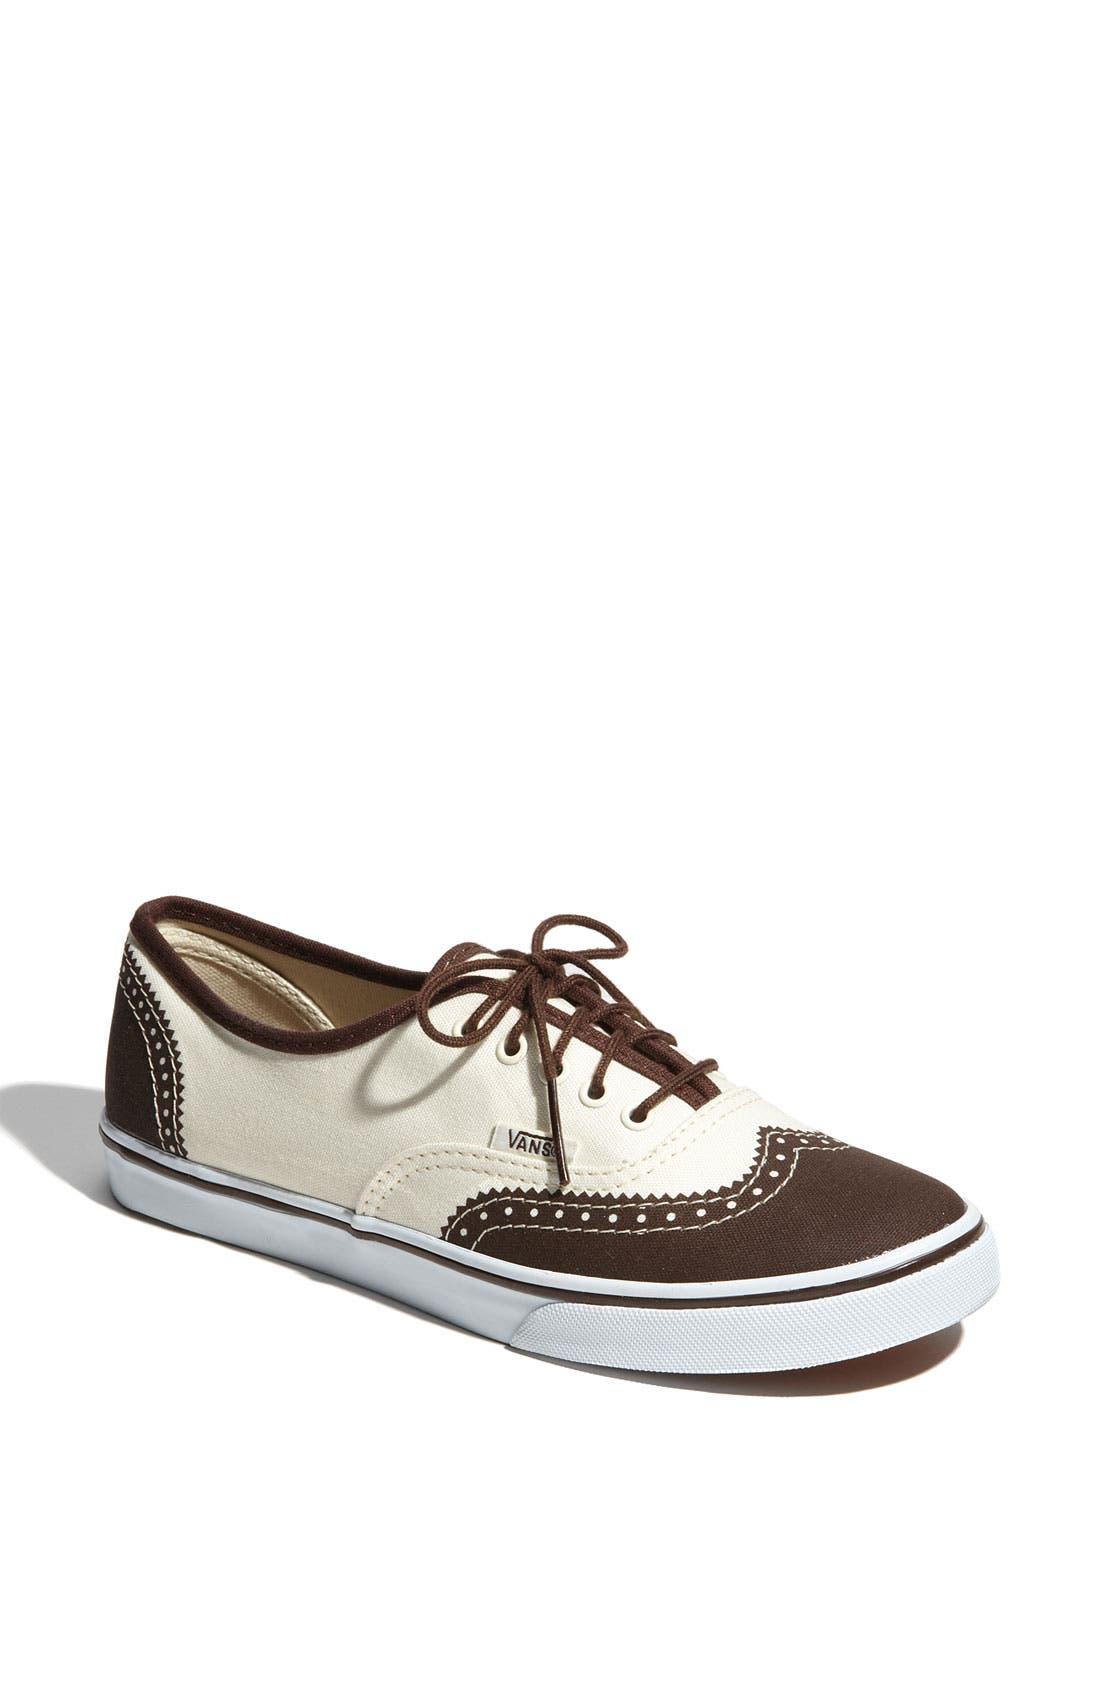 Main Image - Vans 'Oxford Lo Pro' Sneaker